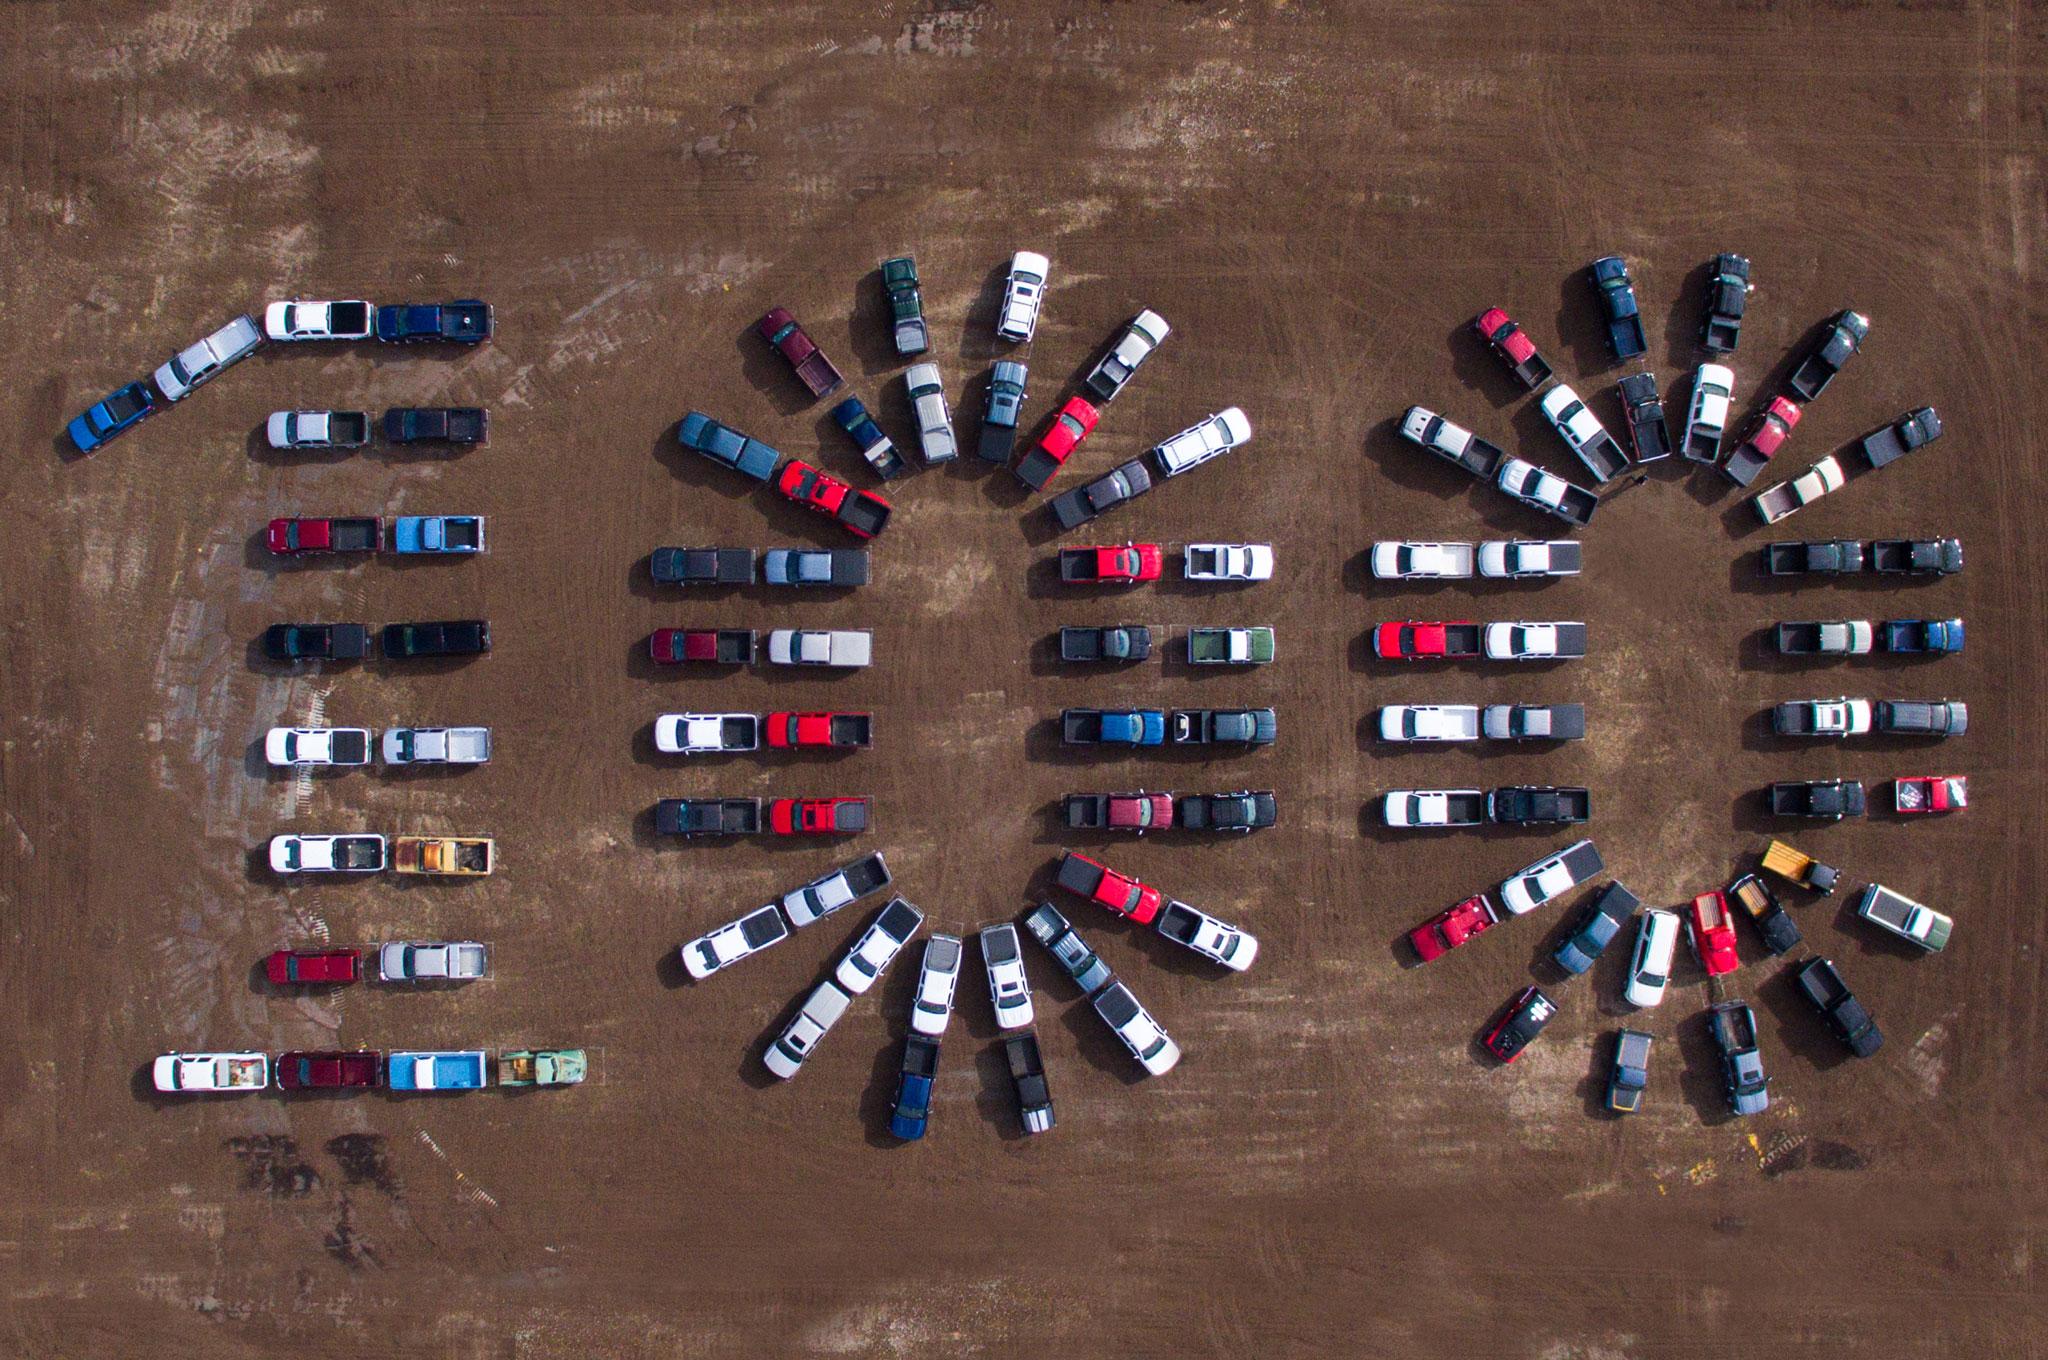 chevy trucks centennial celebration 100 trucks 100 years